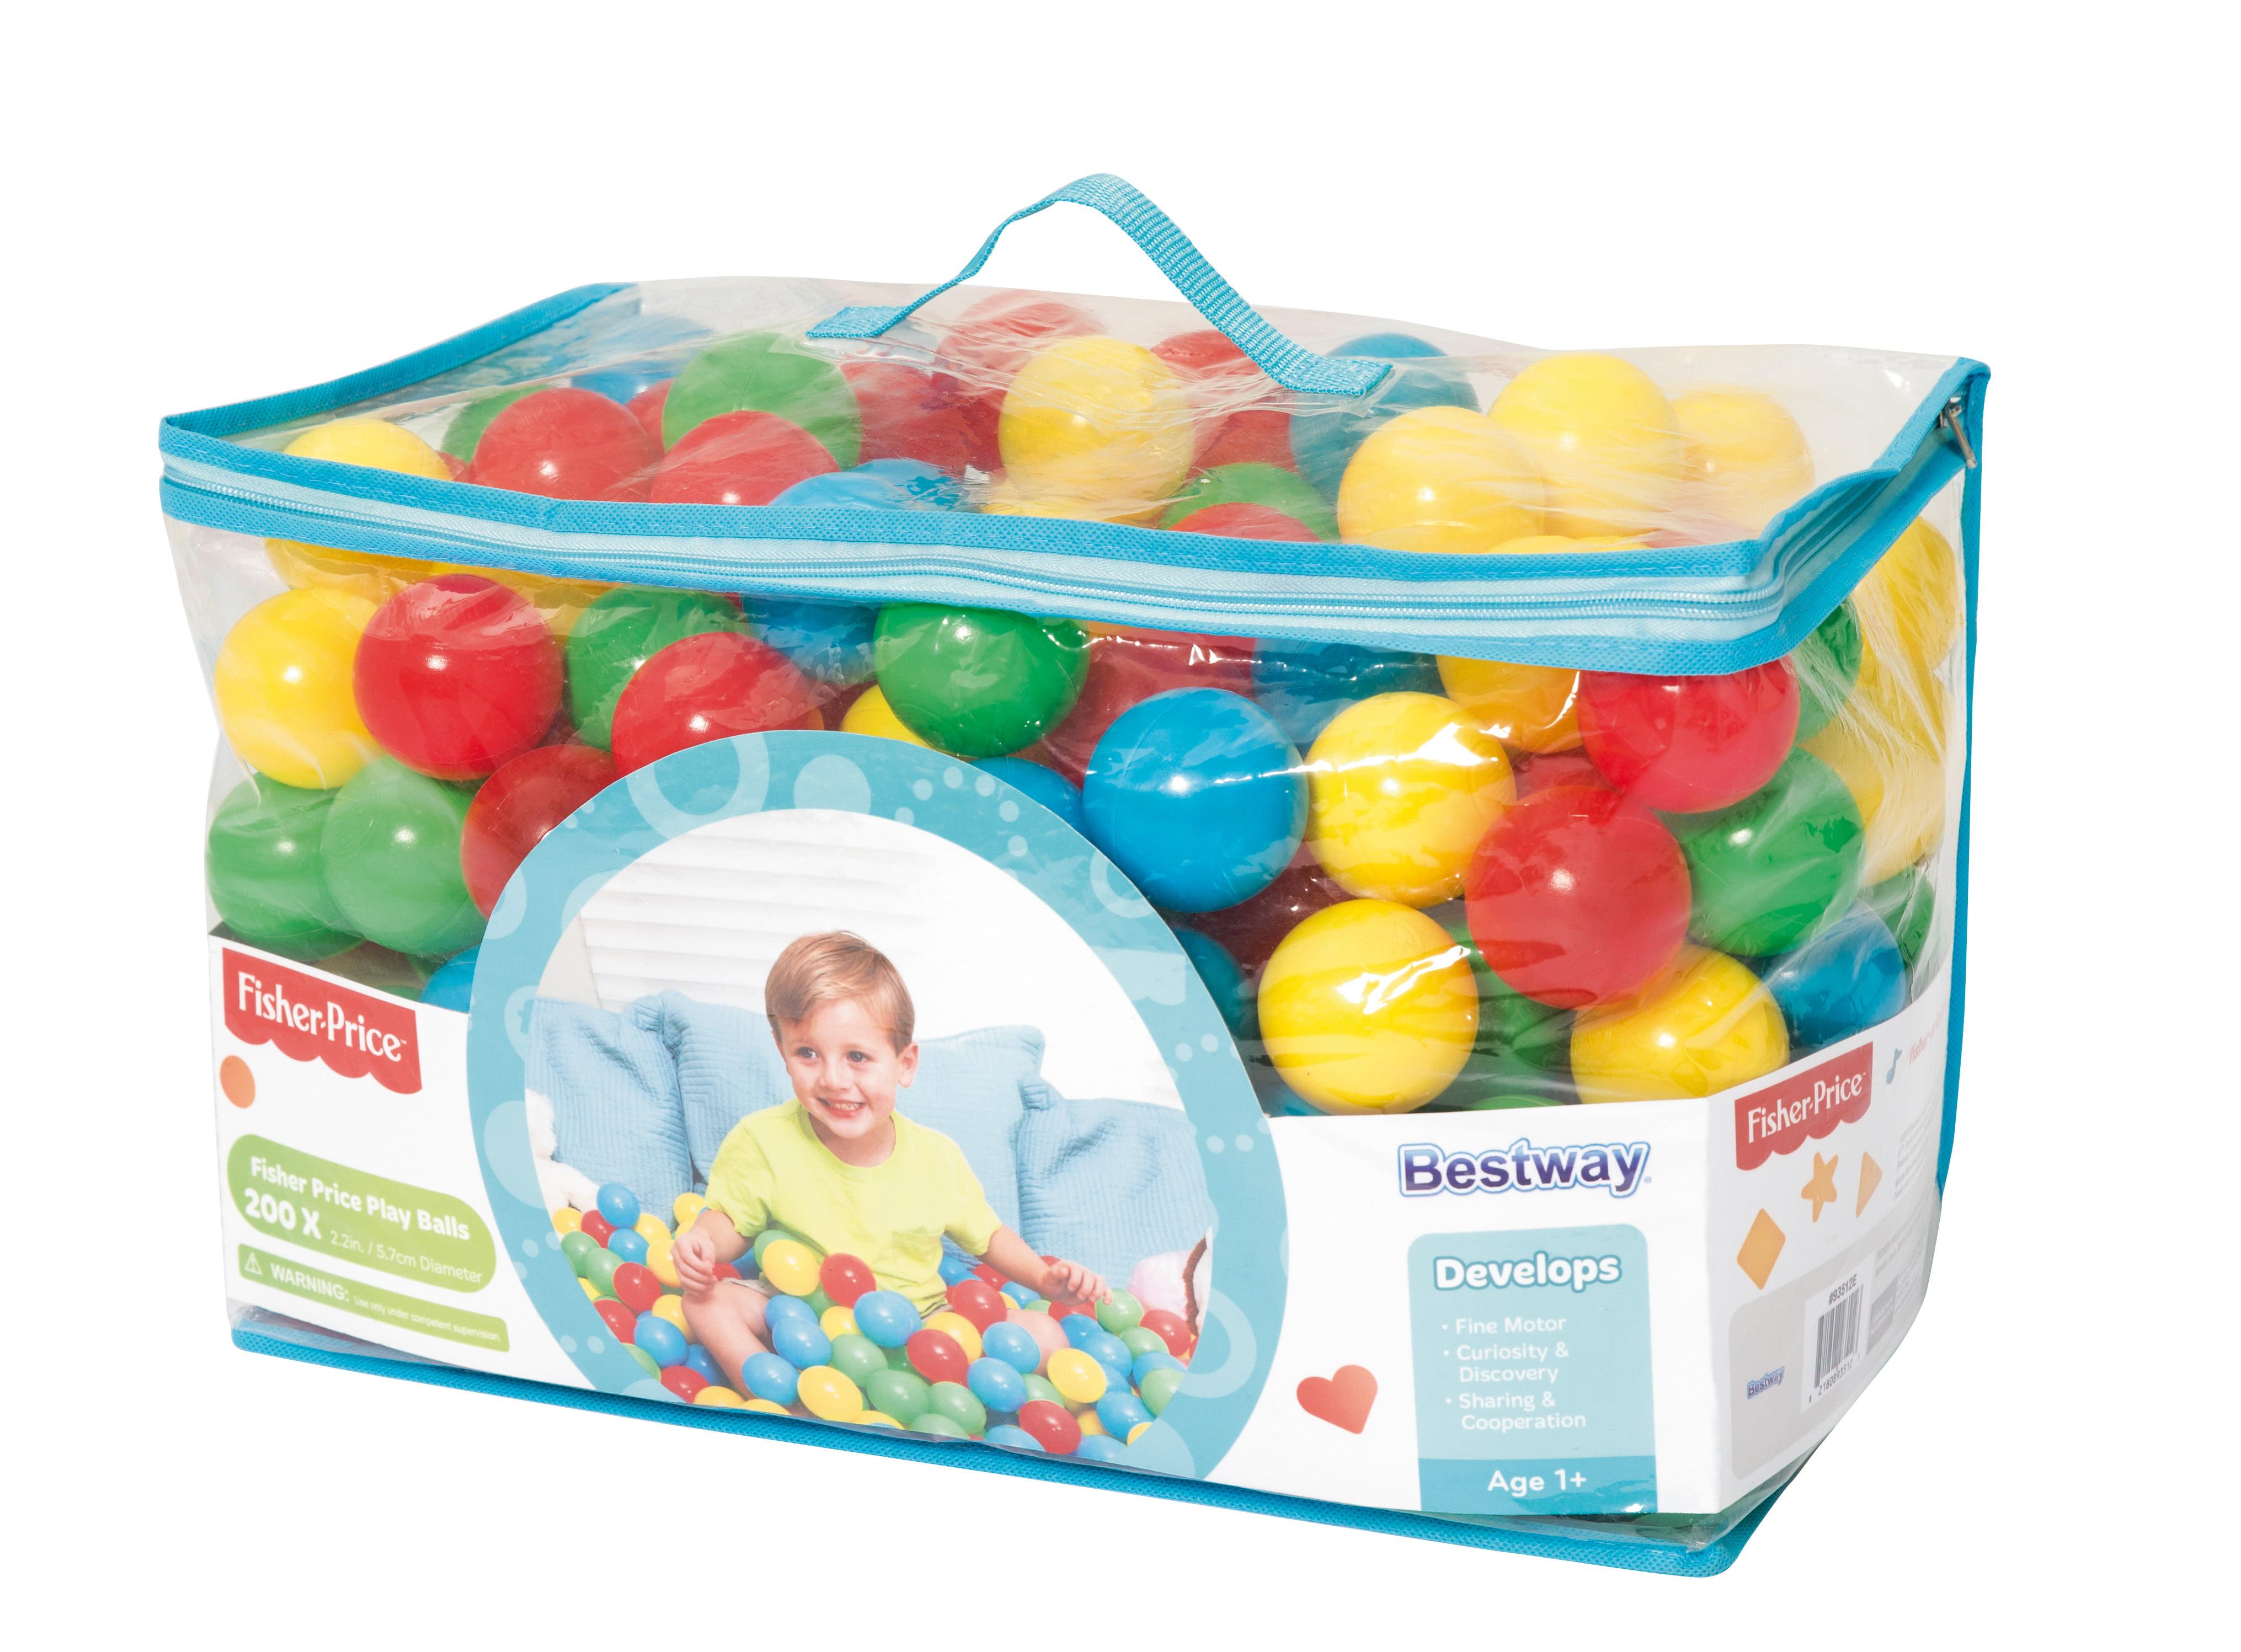 Bestway Fisher Price 200 Play Balls by Bestway